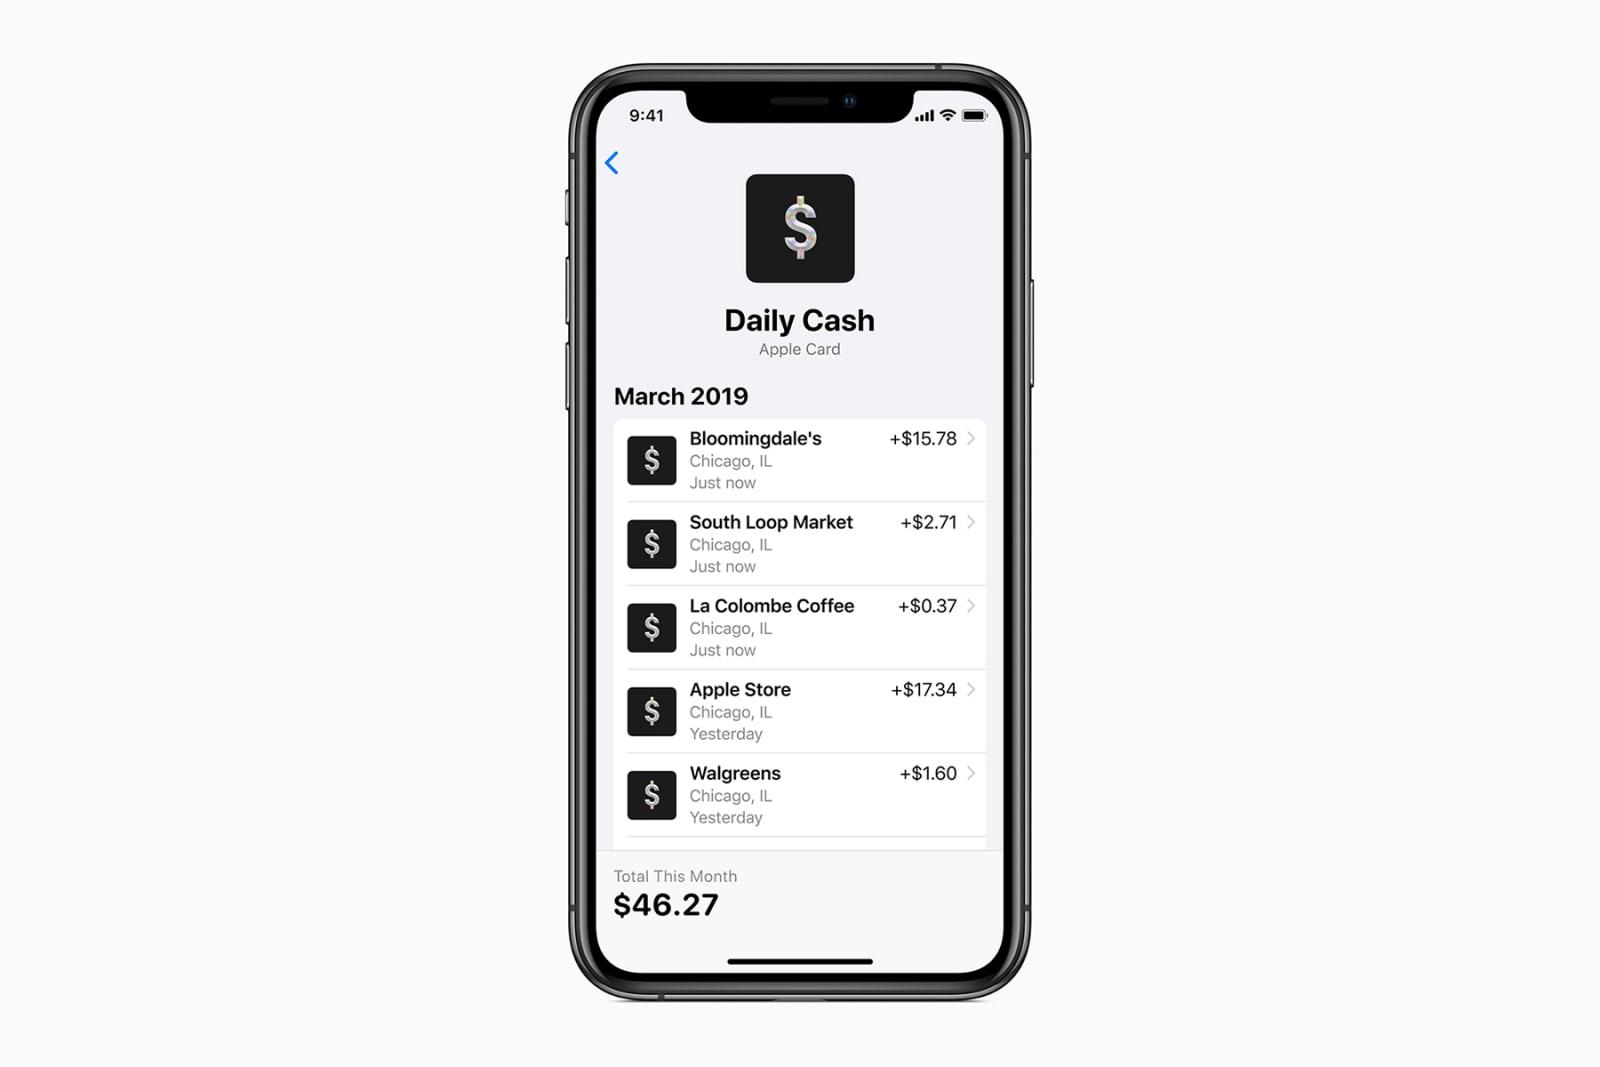 Apple Card cash